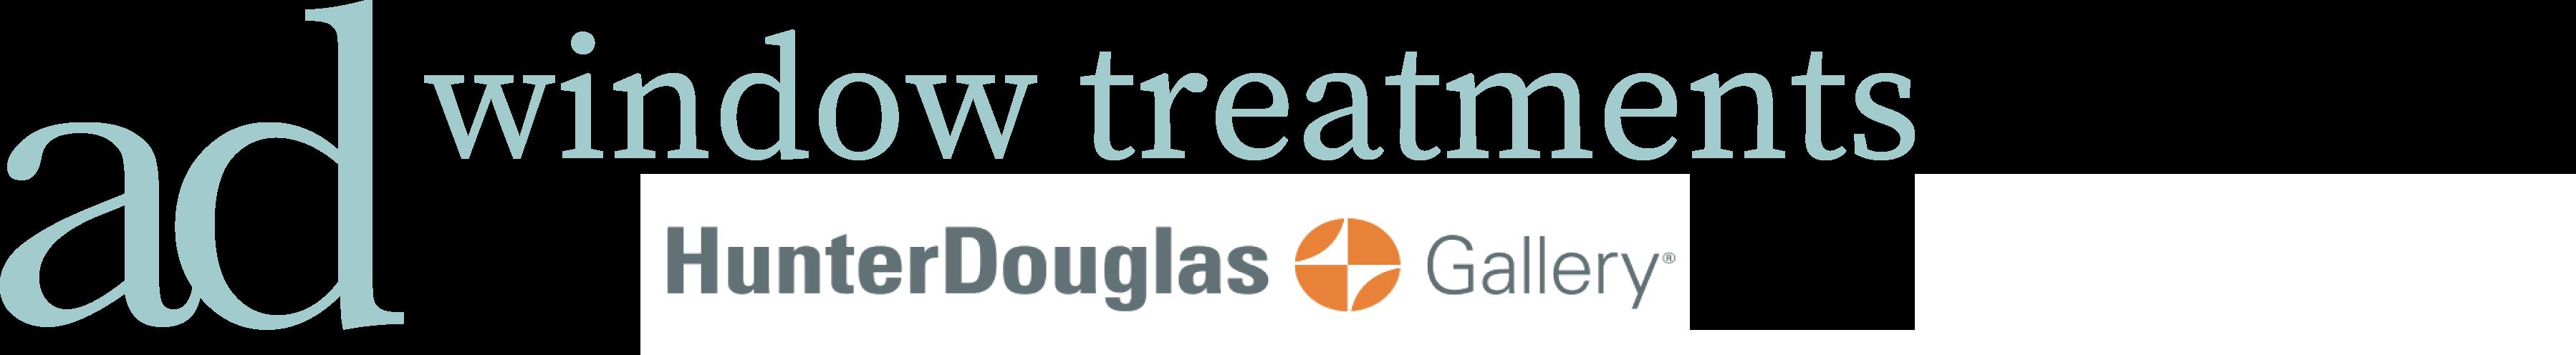 AD window treatments logo